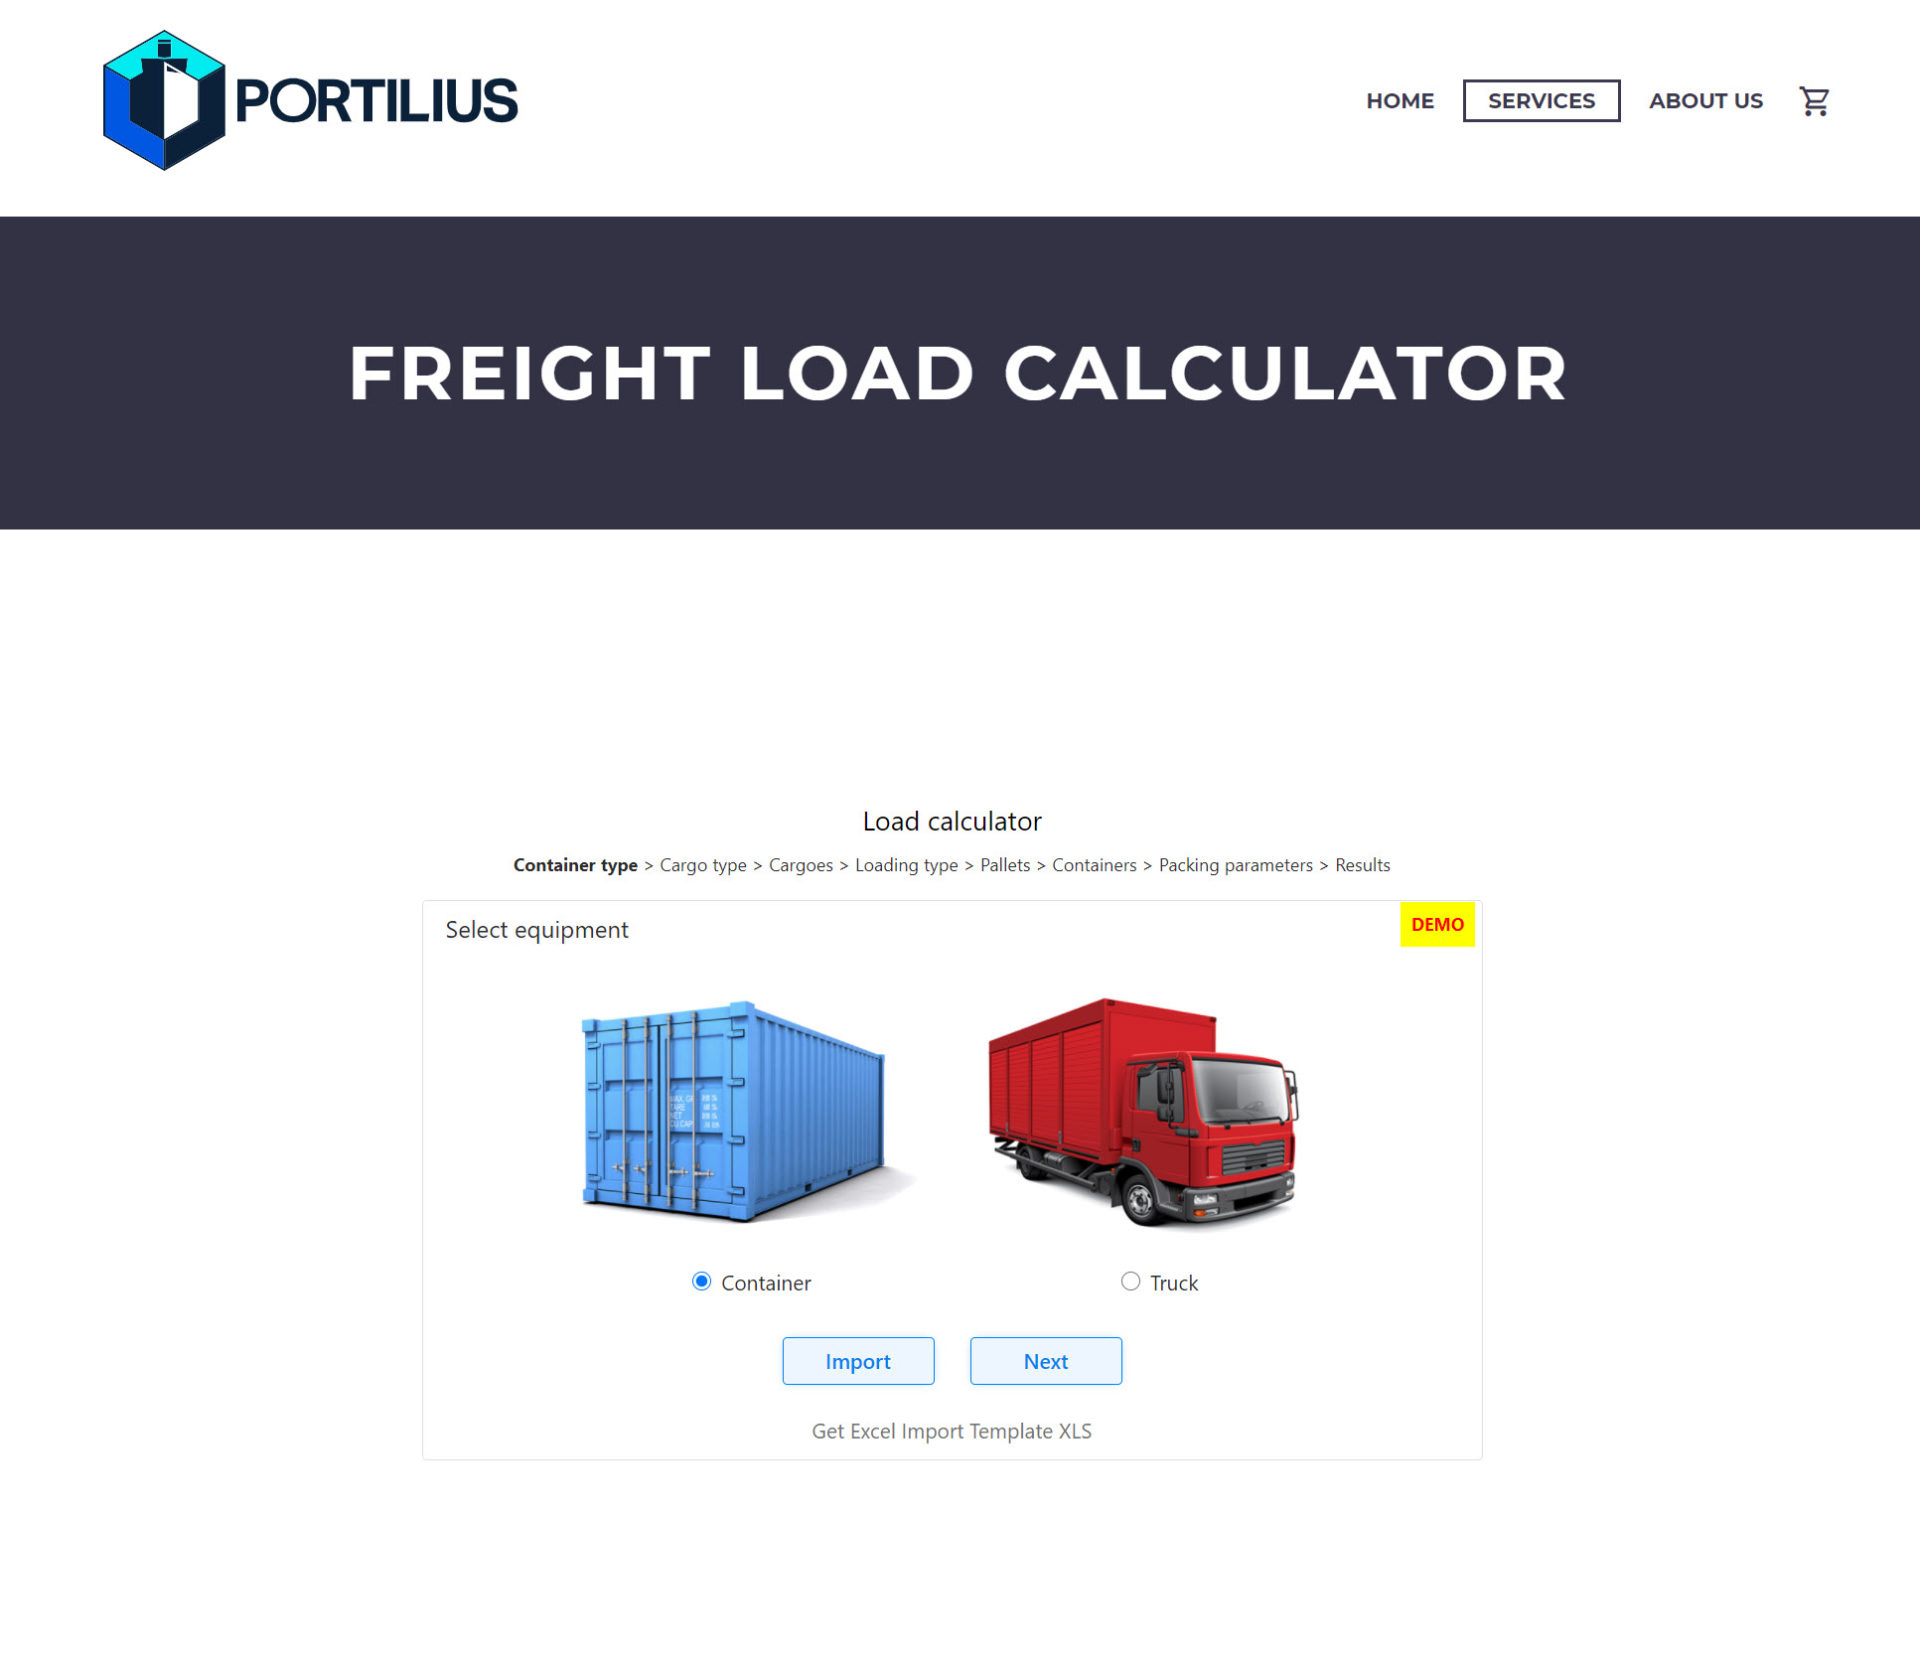 Freightloadcalculator